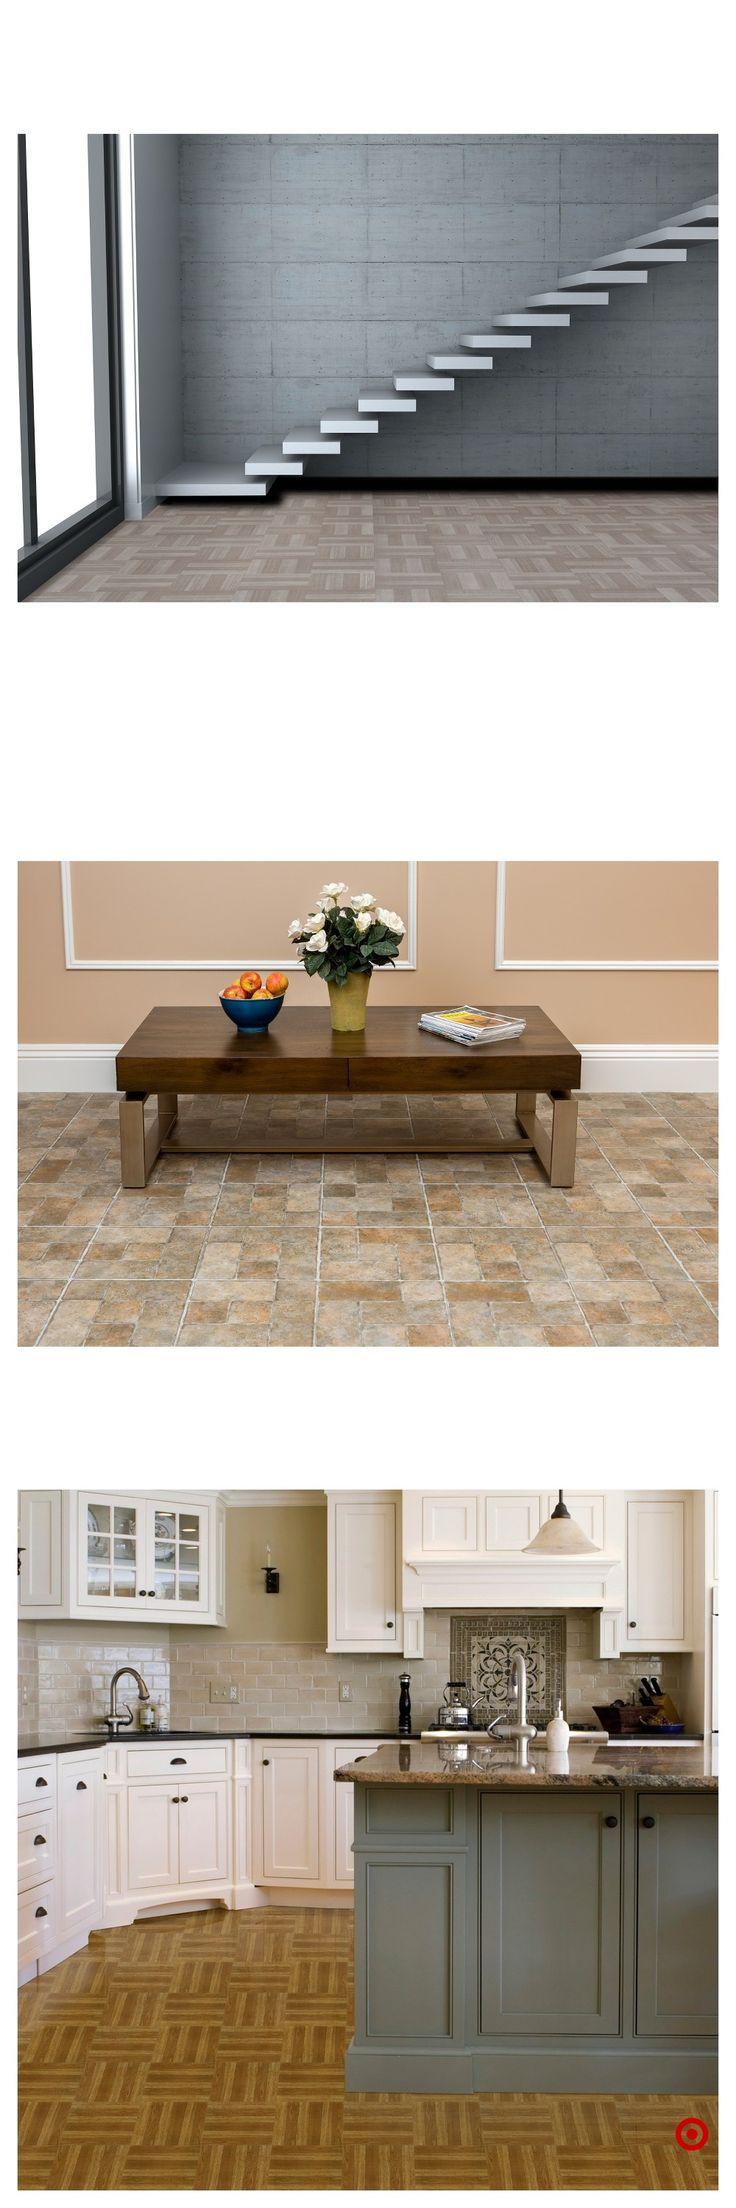 Shop Target For Carpet Tiles You Will Love At Great Low Prices. Free  Shipping On · Backsplash IdeasKitchen BacksplashThree Season ...